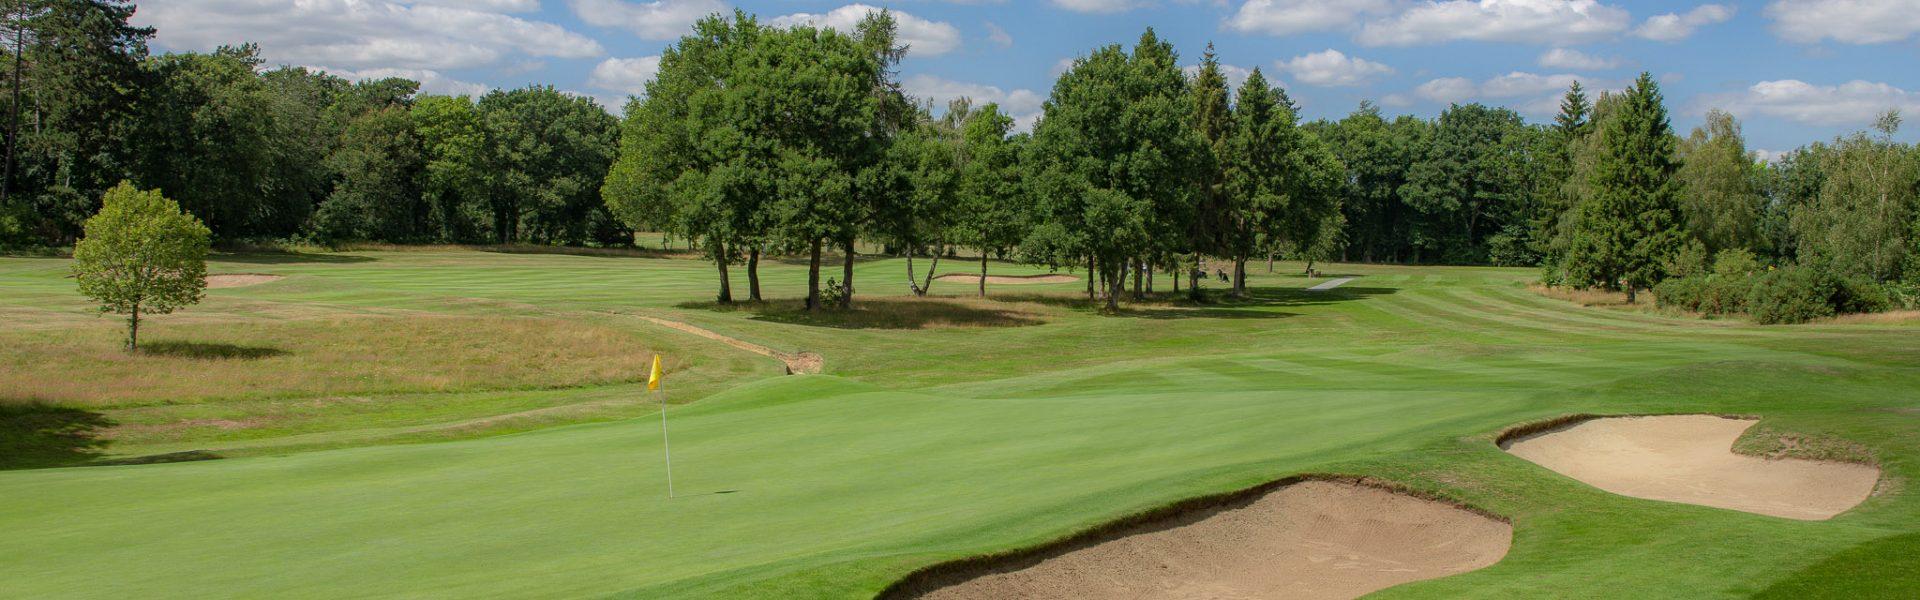 Denham Golf Club Buckinghamshire